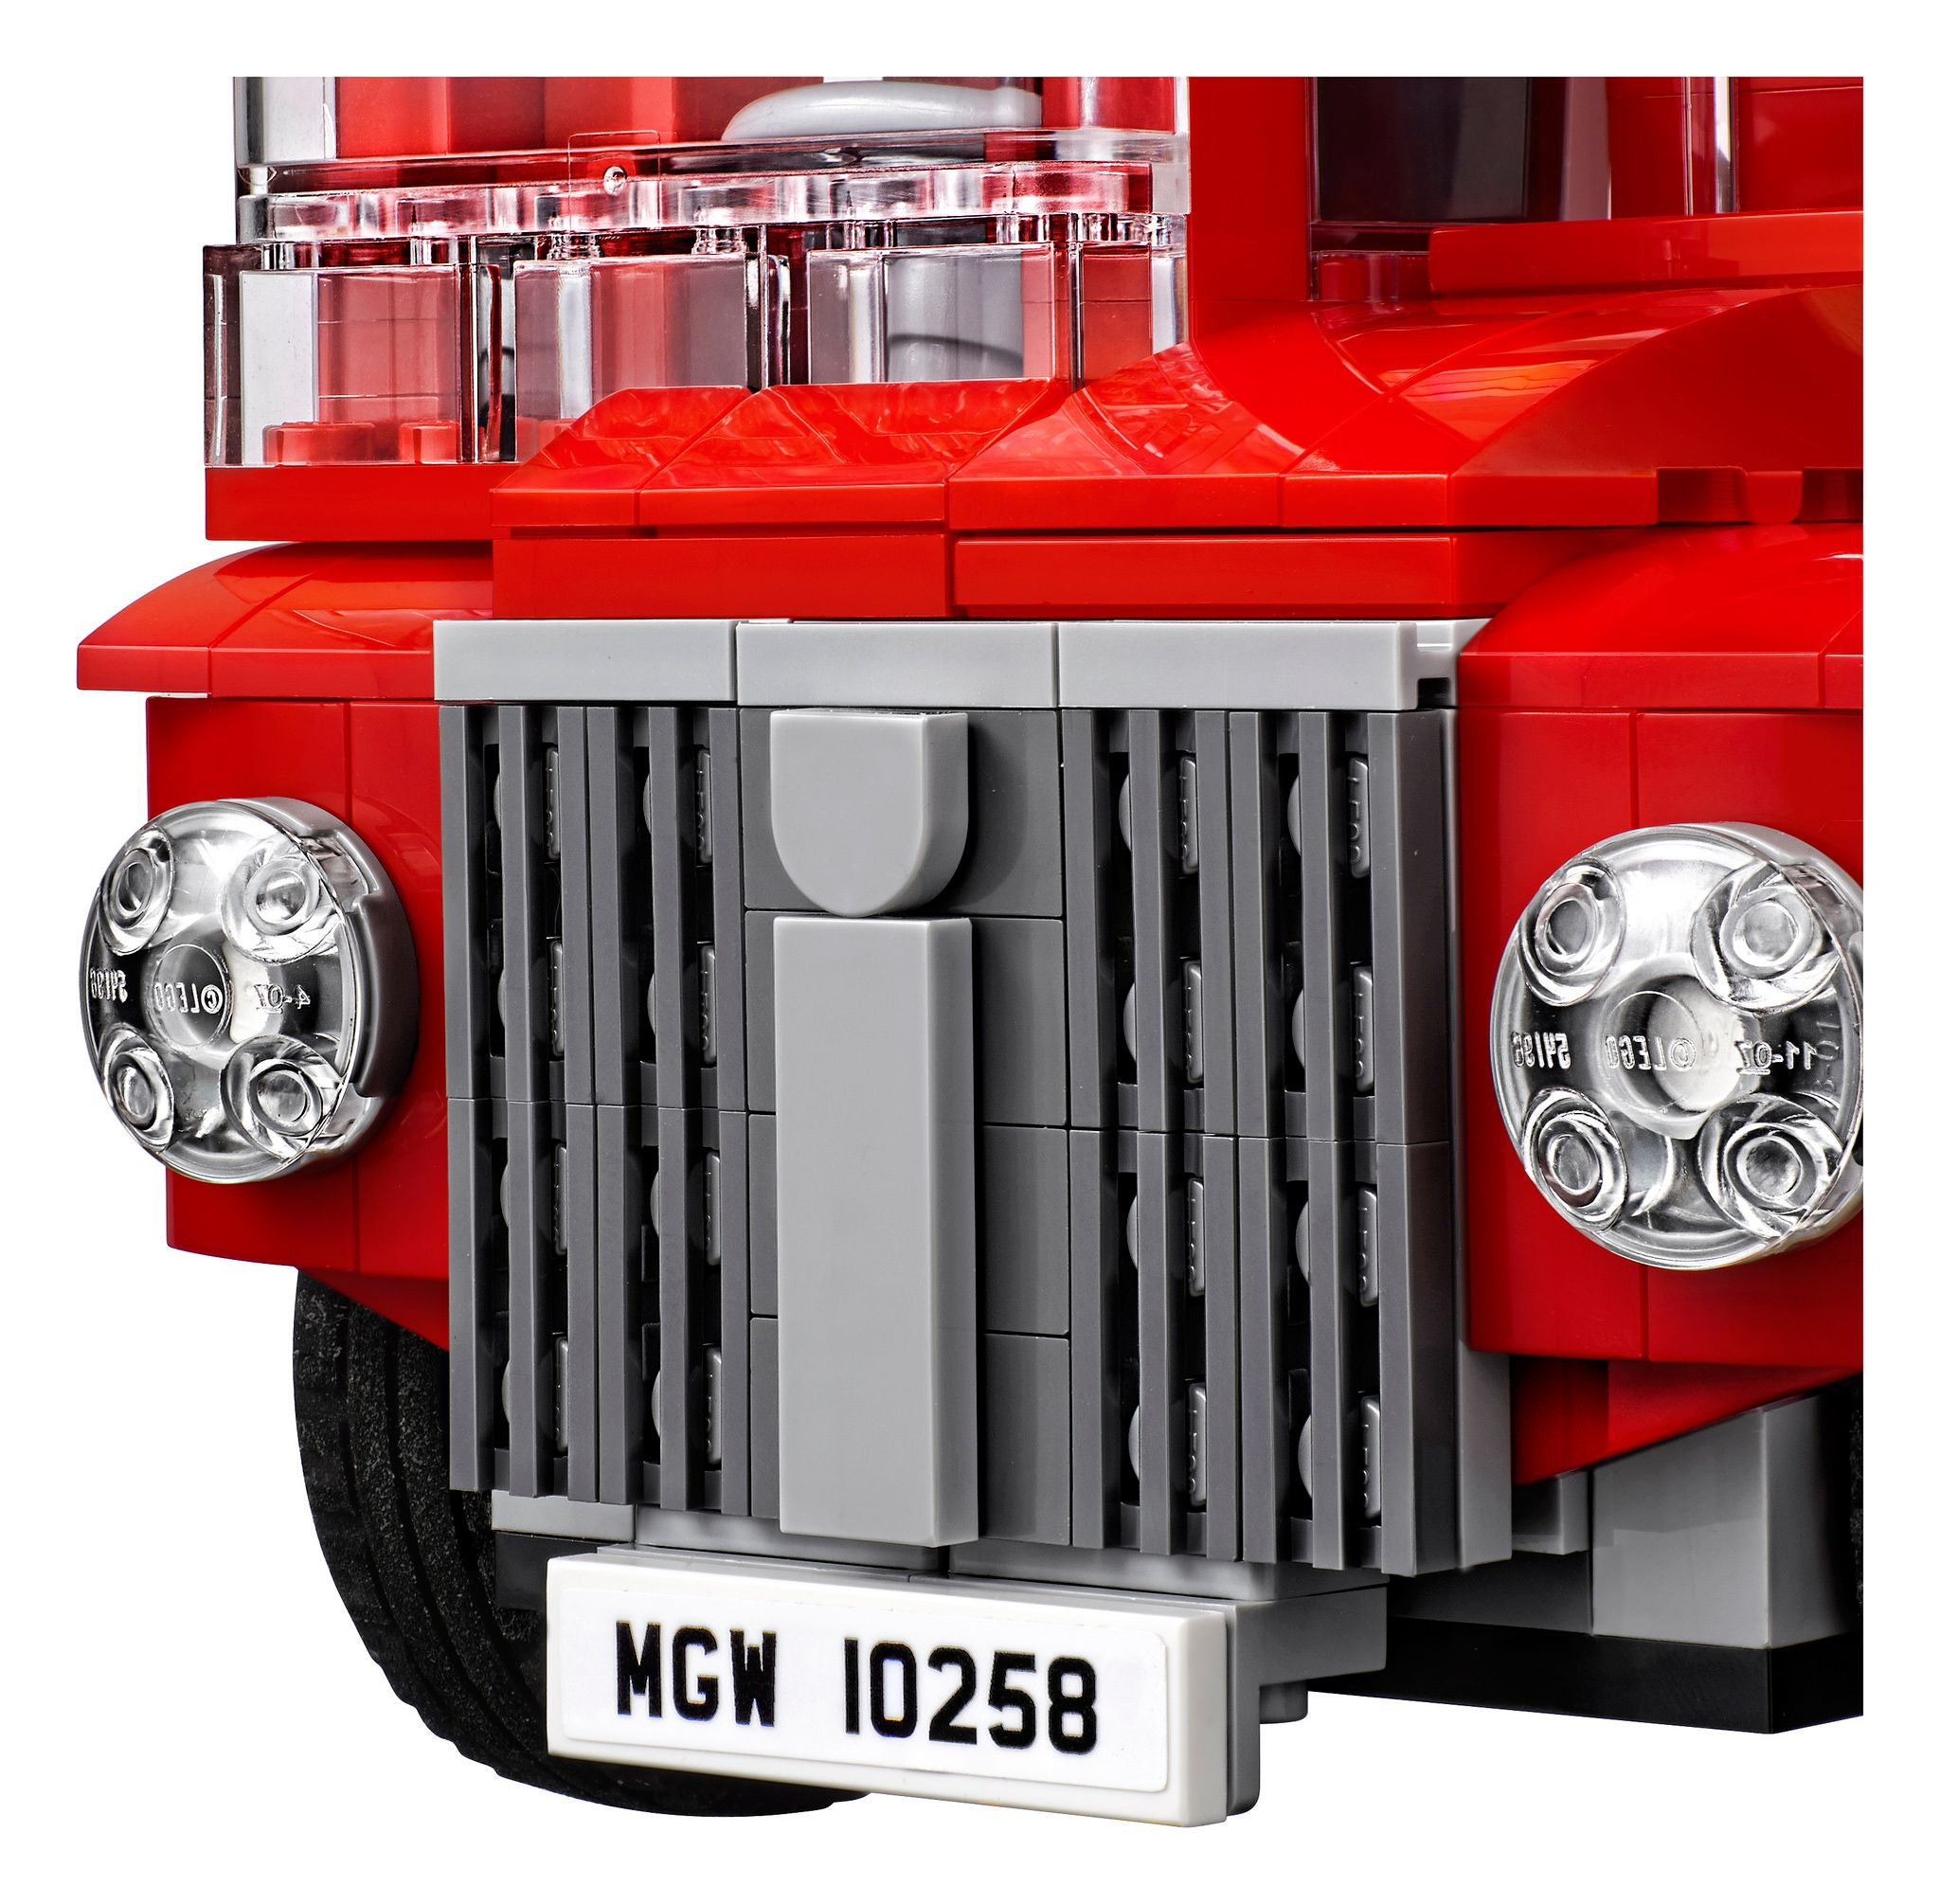 LEGO-London-Bus-08